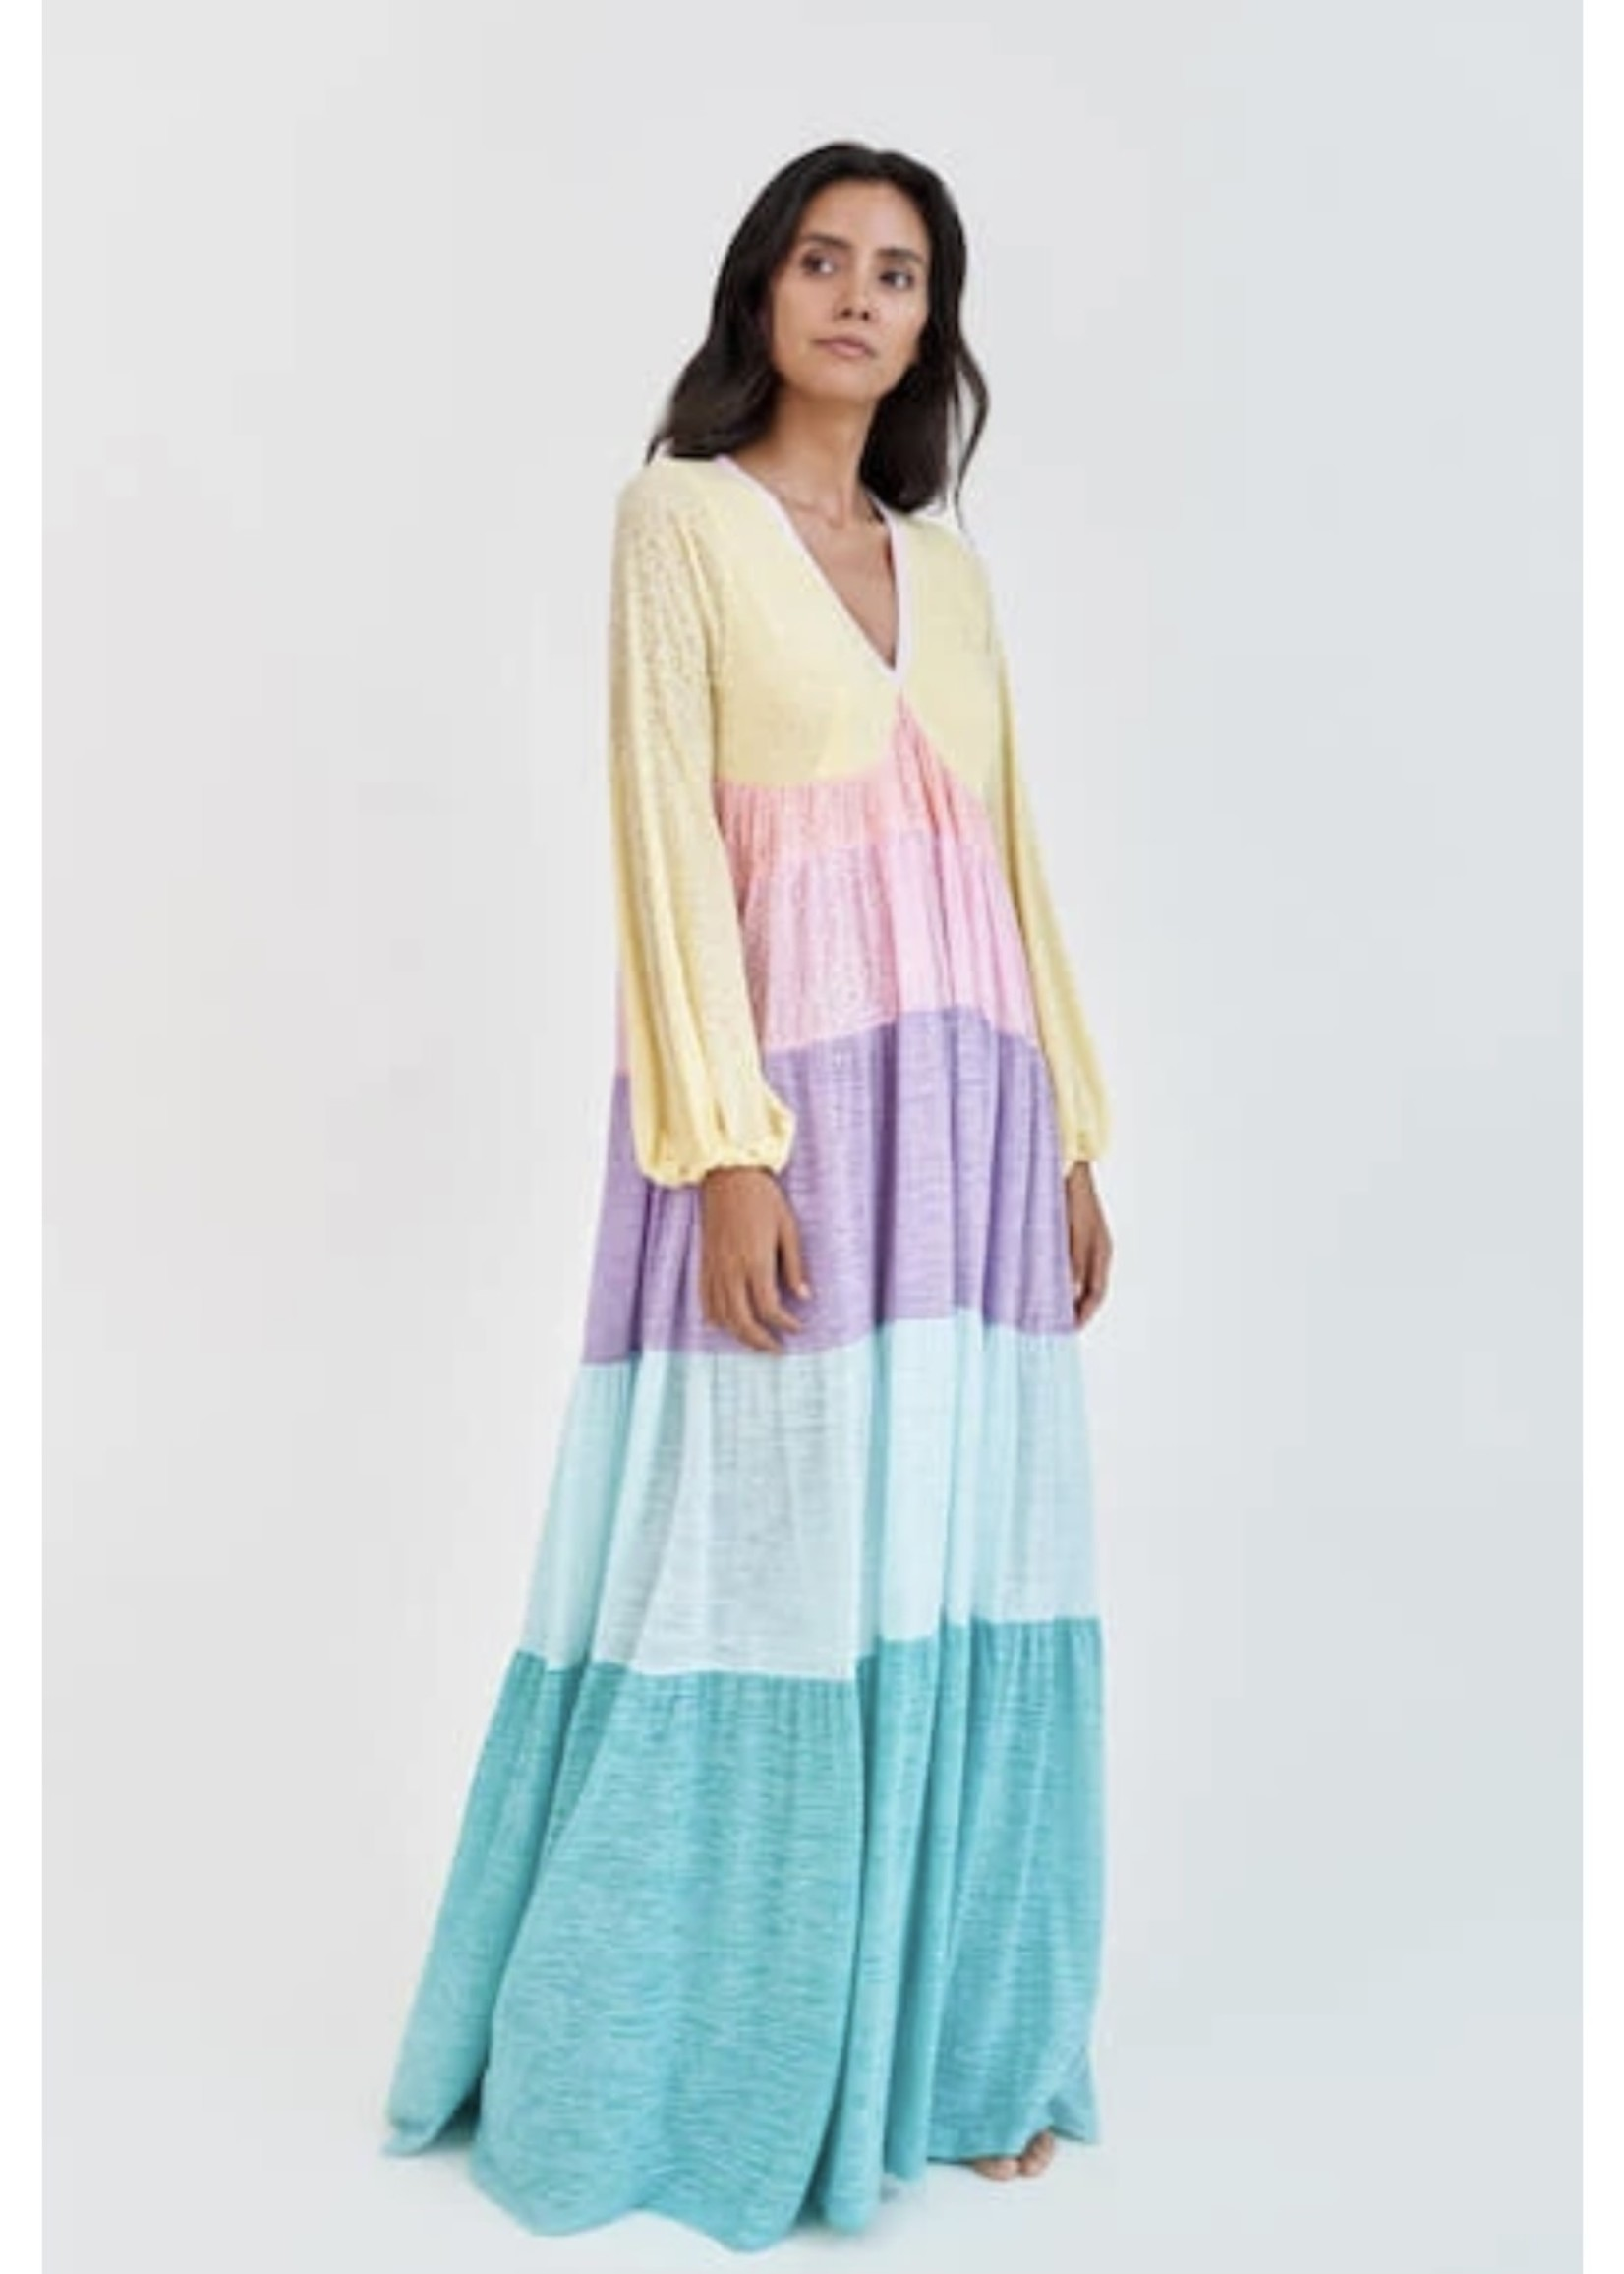 Guts & Goats Rainbow V-Neck Dress